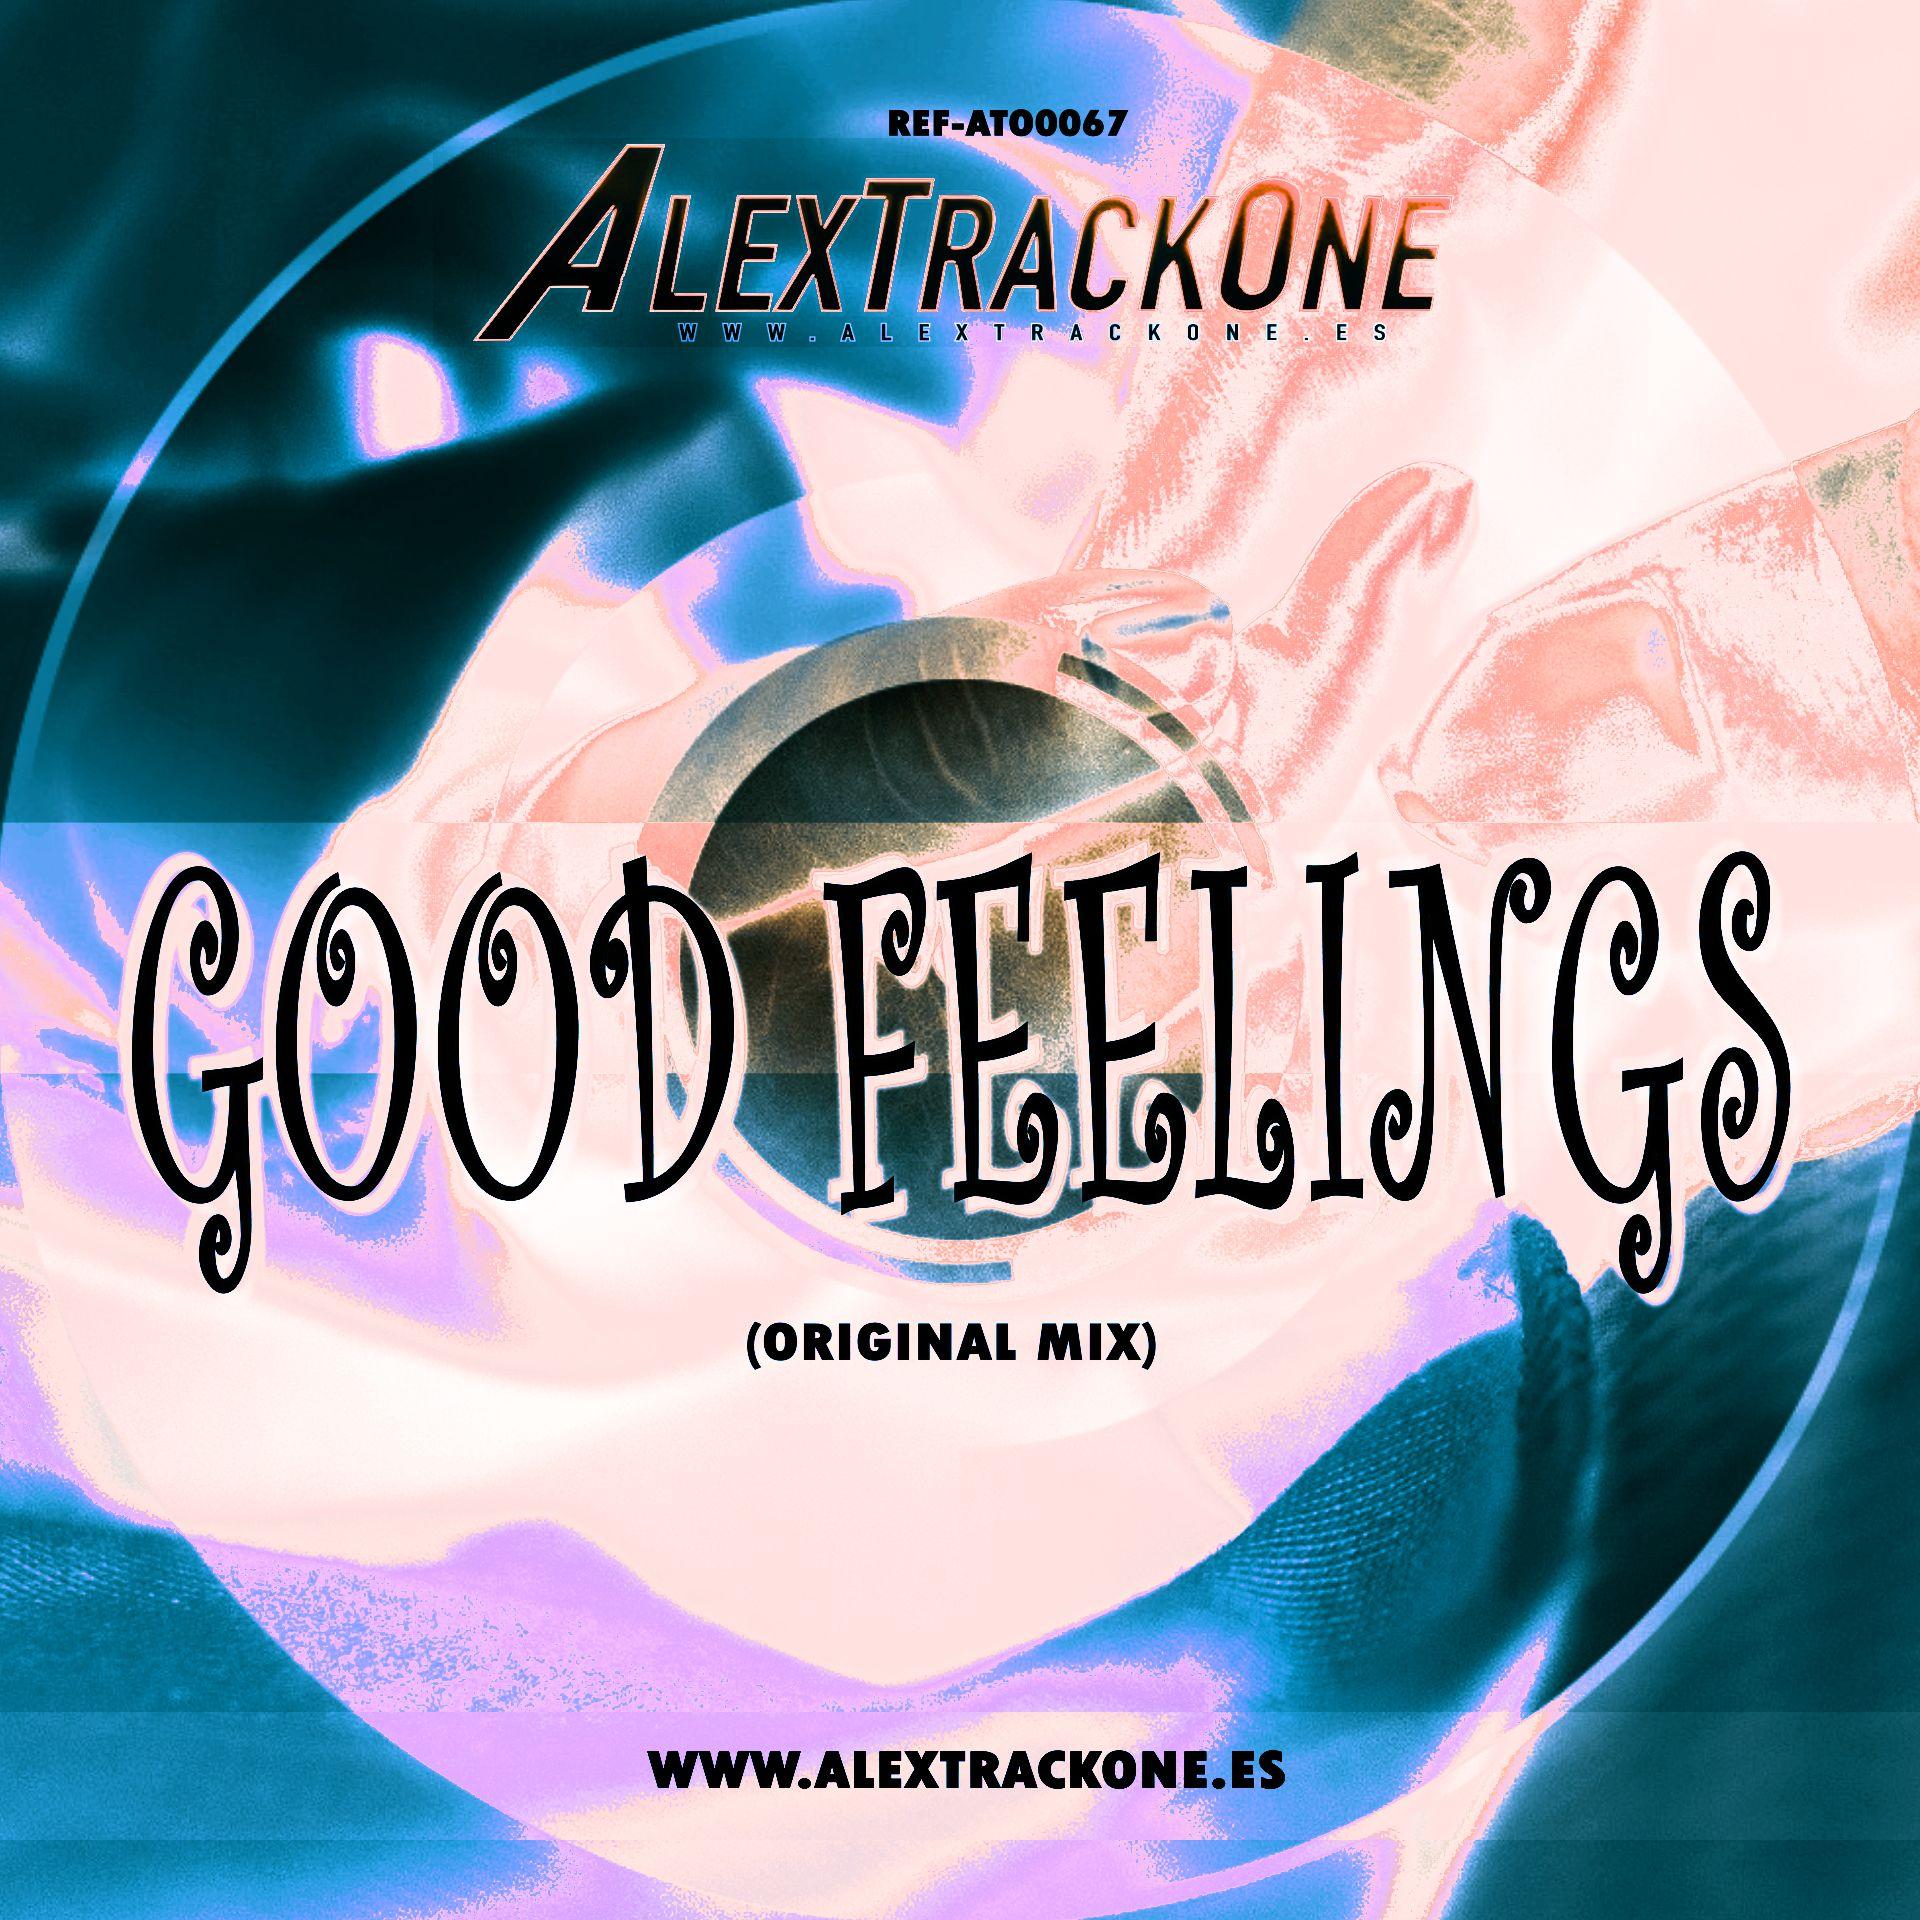 REF-ATO0067 GODD FEELINGS (ORIGINAL MIX) (MP3 & WAV & FLAC)